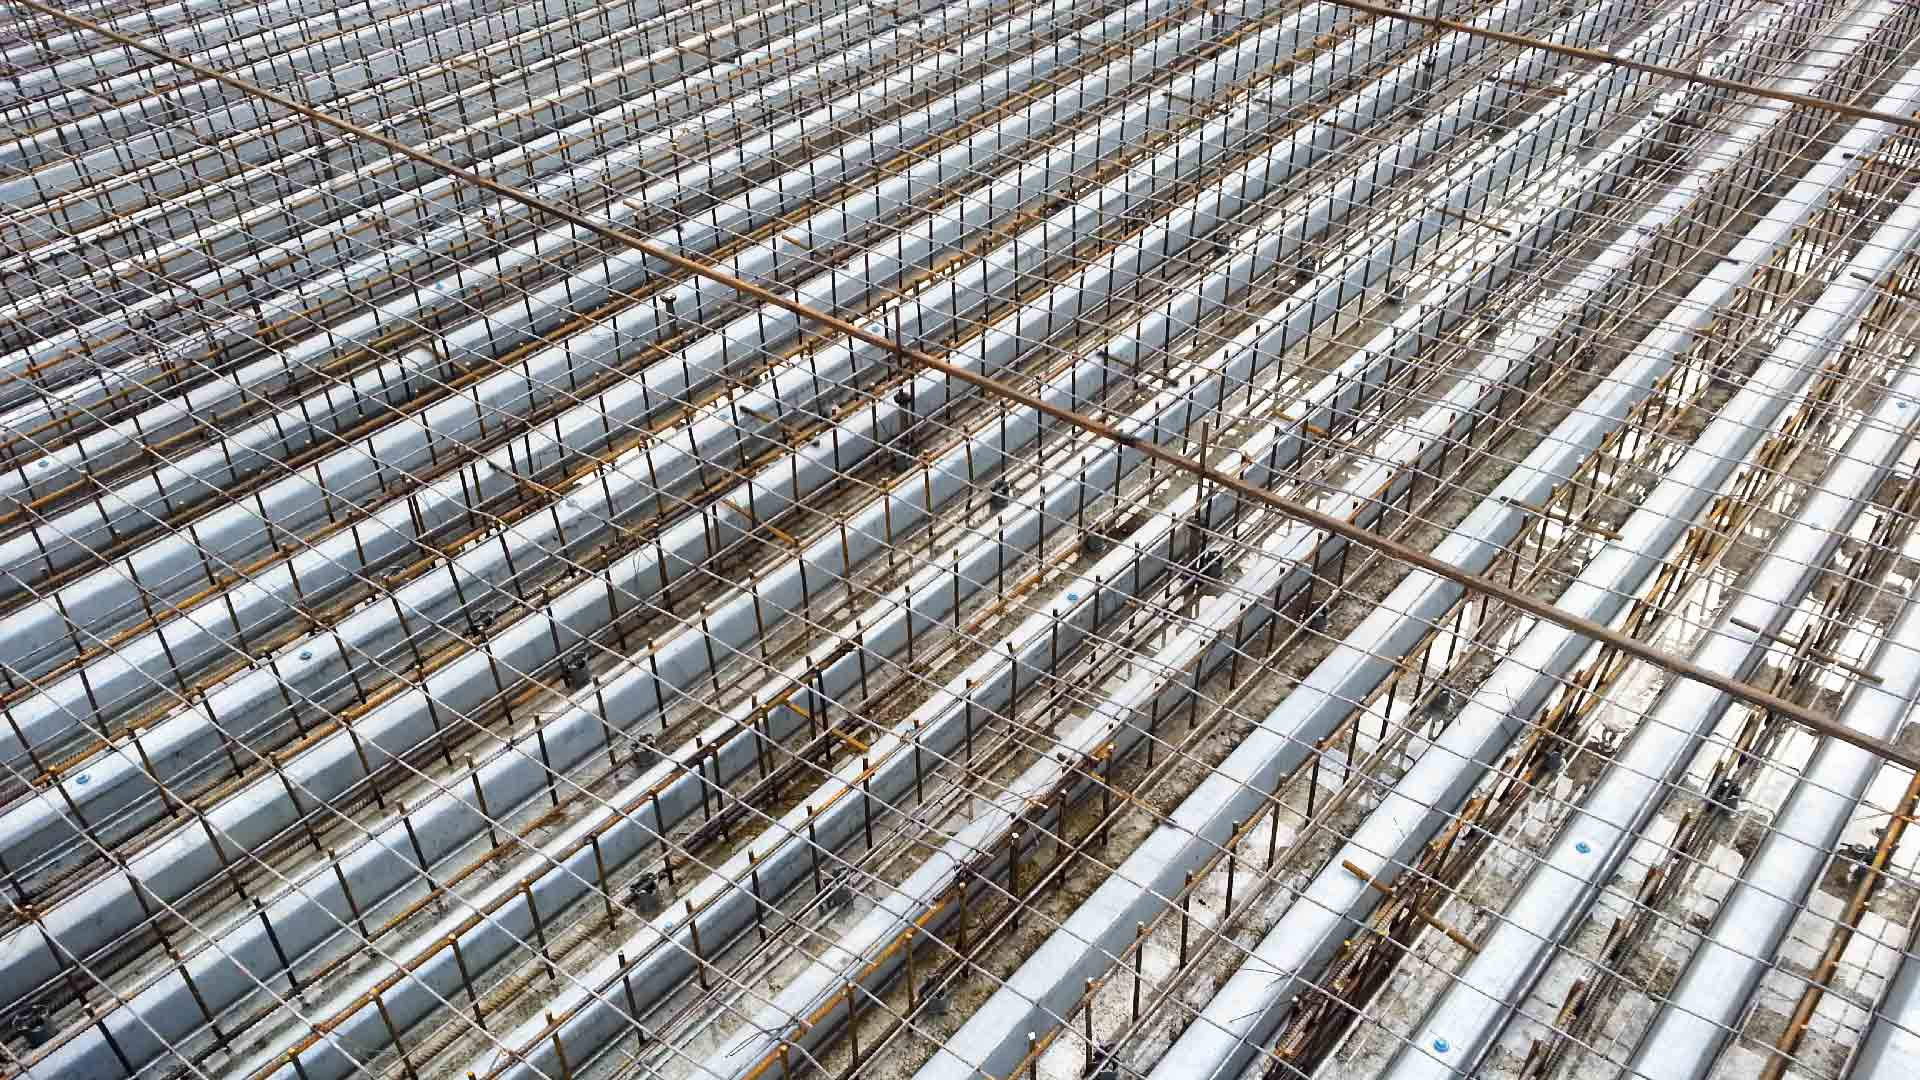 ТРЦ «KYIV MALL» - Строительная компания «Riola»